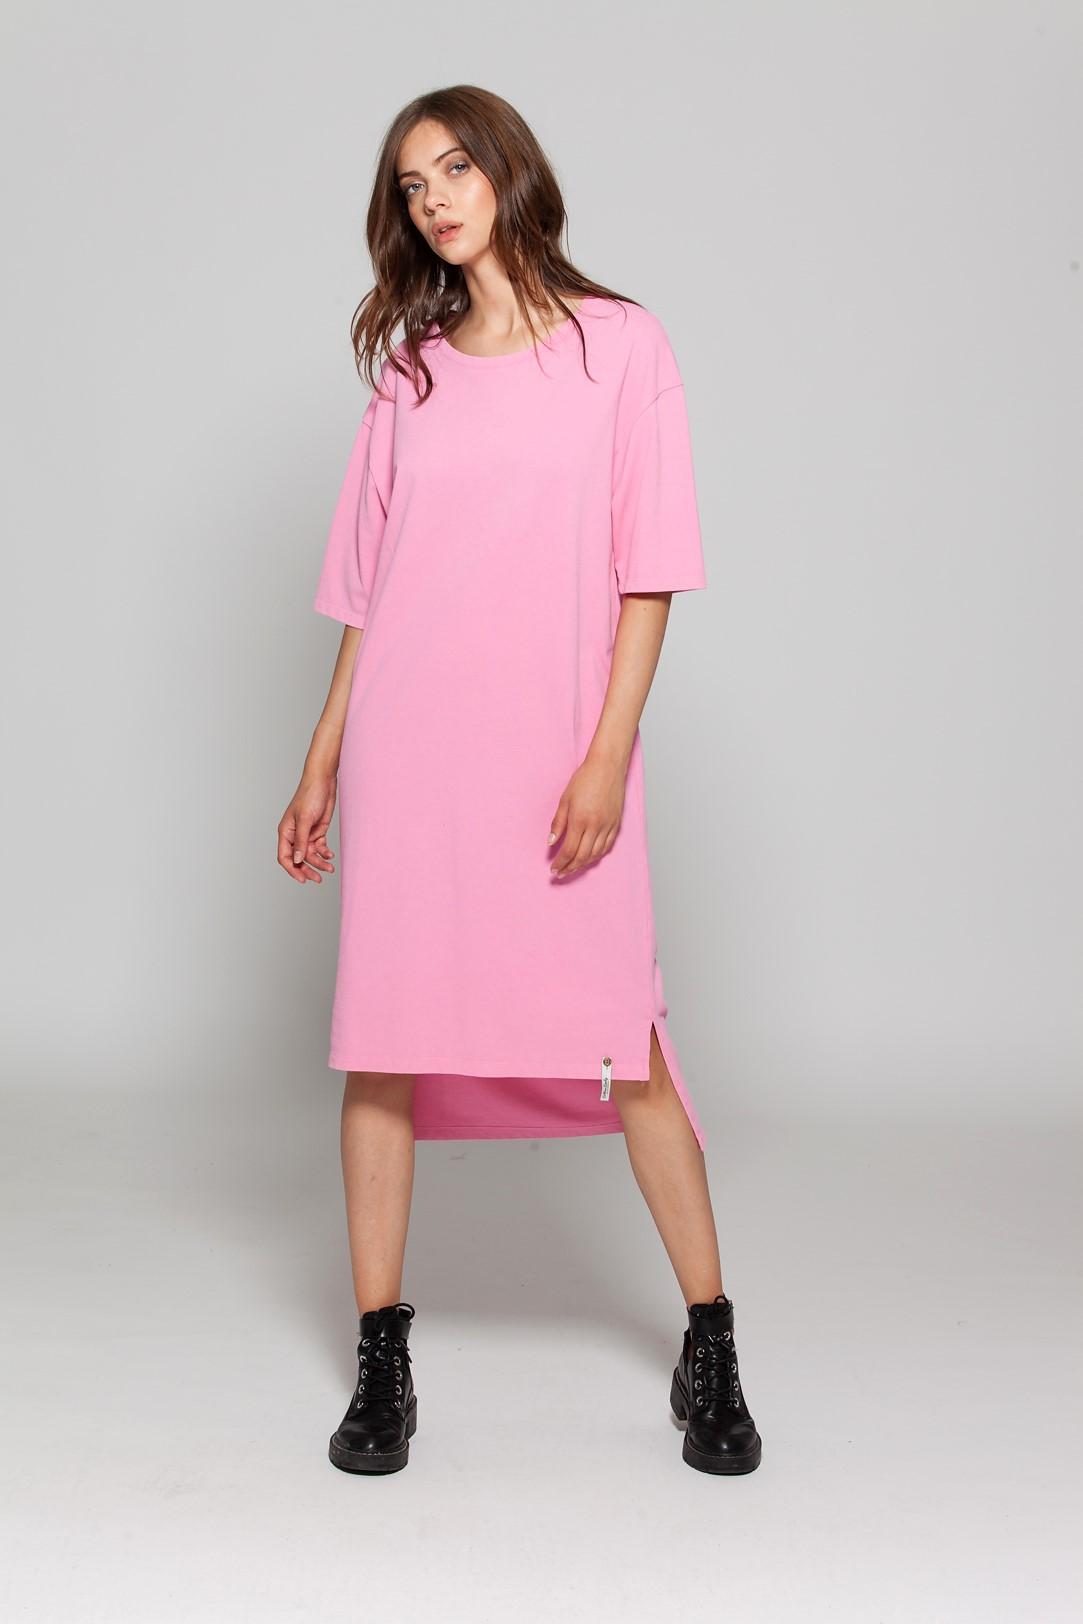 Cotton Candy Iwana KL 05 Damen Polo Kleid